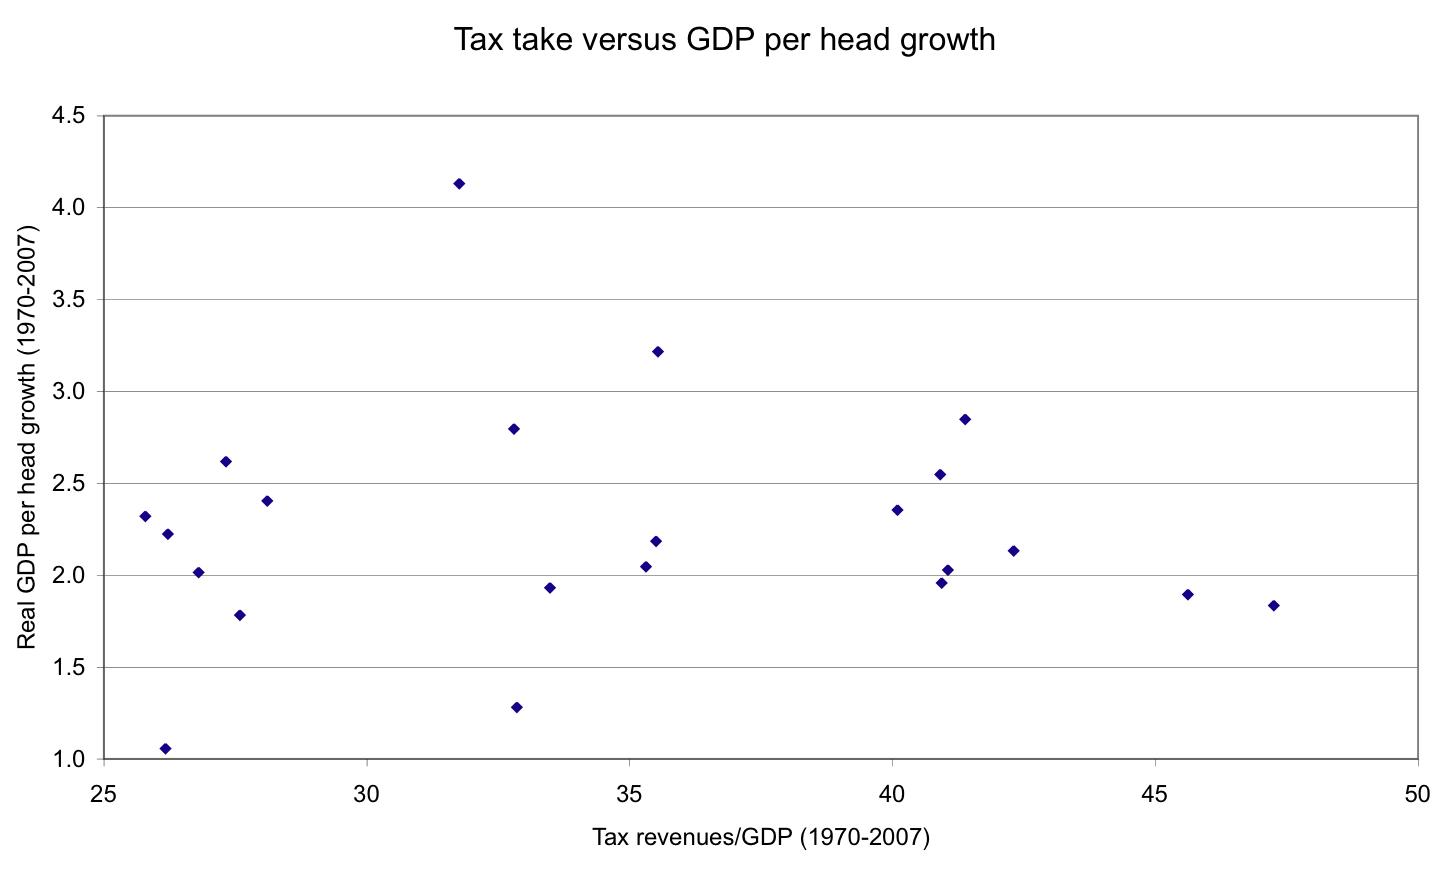 Tax take vs. growth in GDP per capita